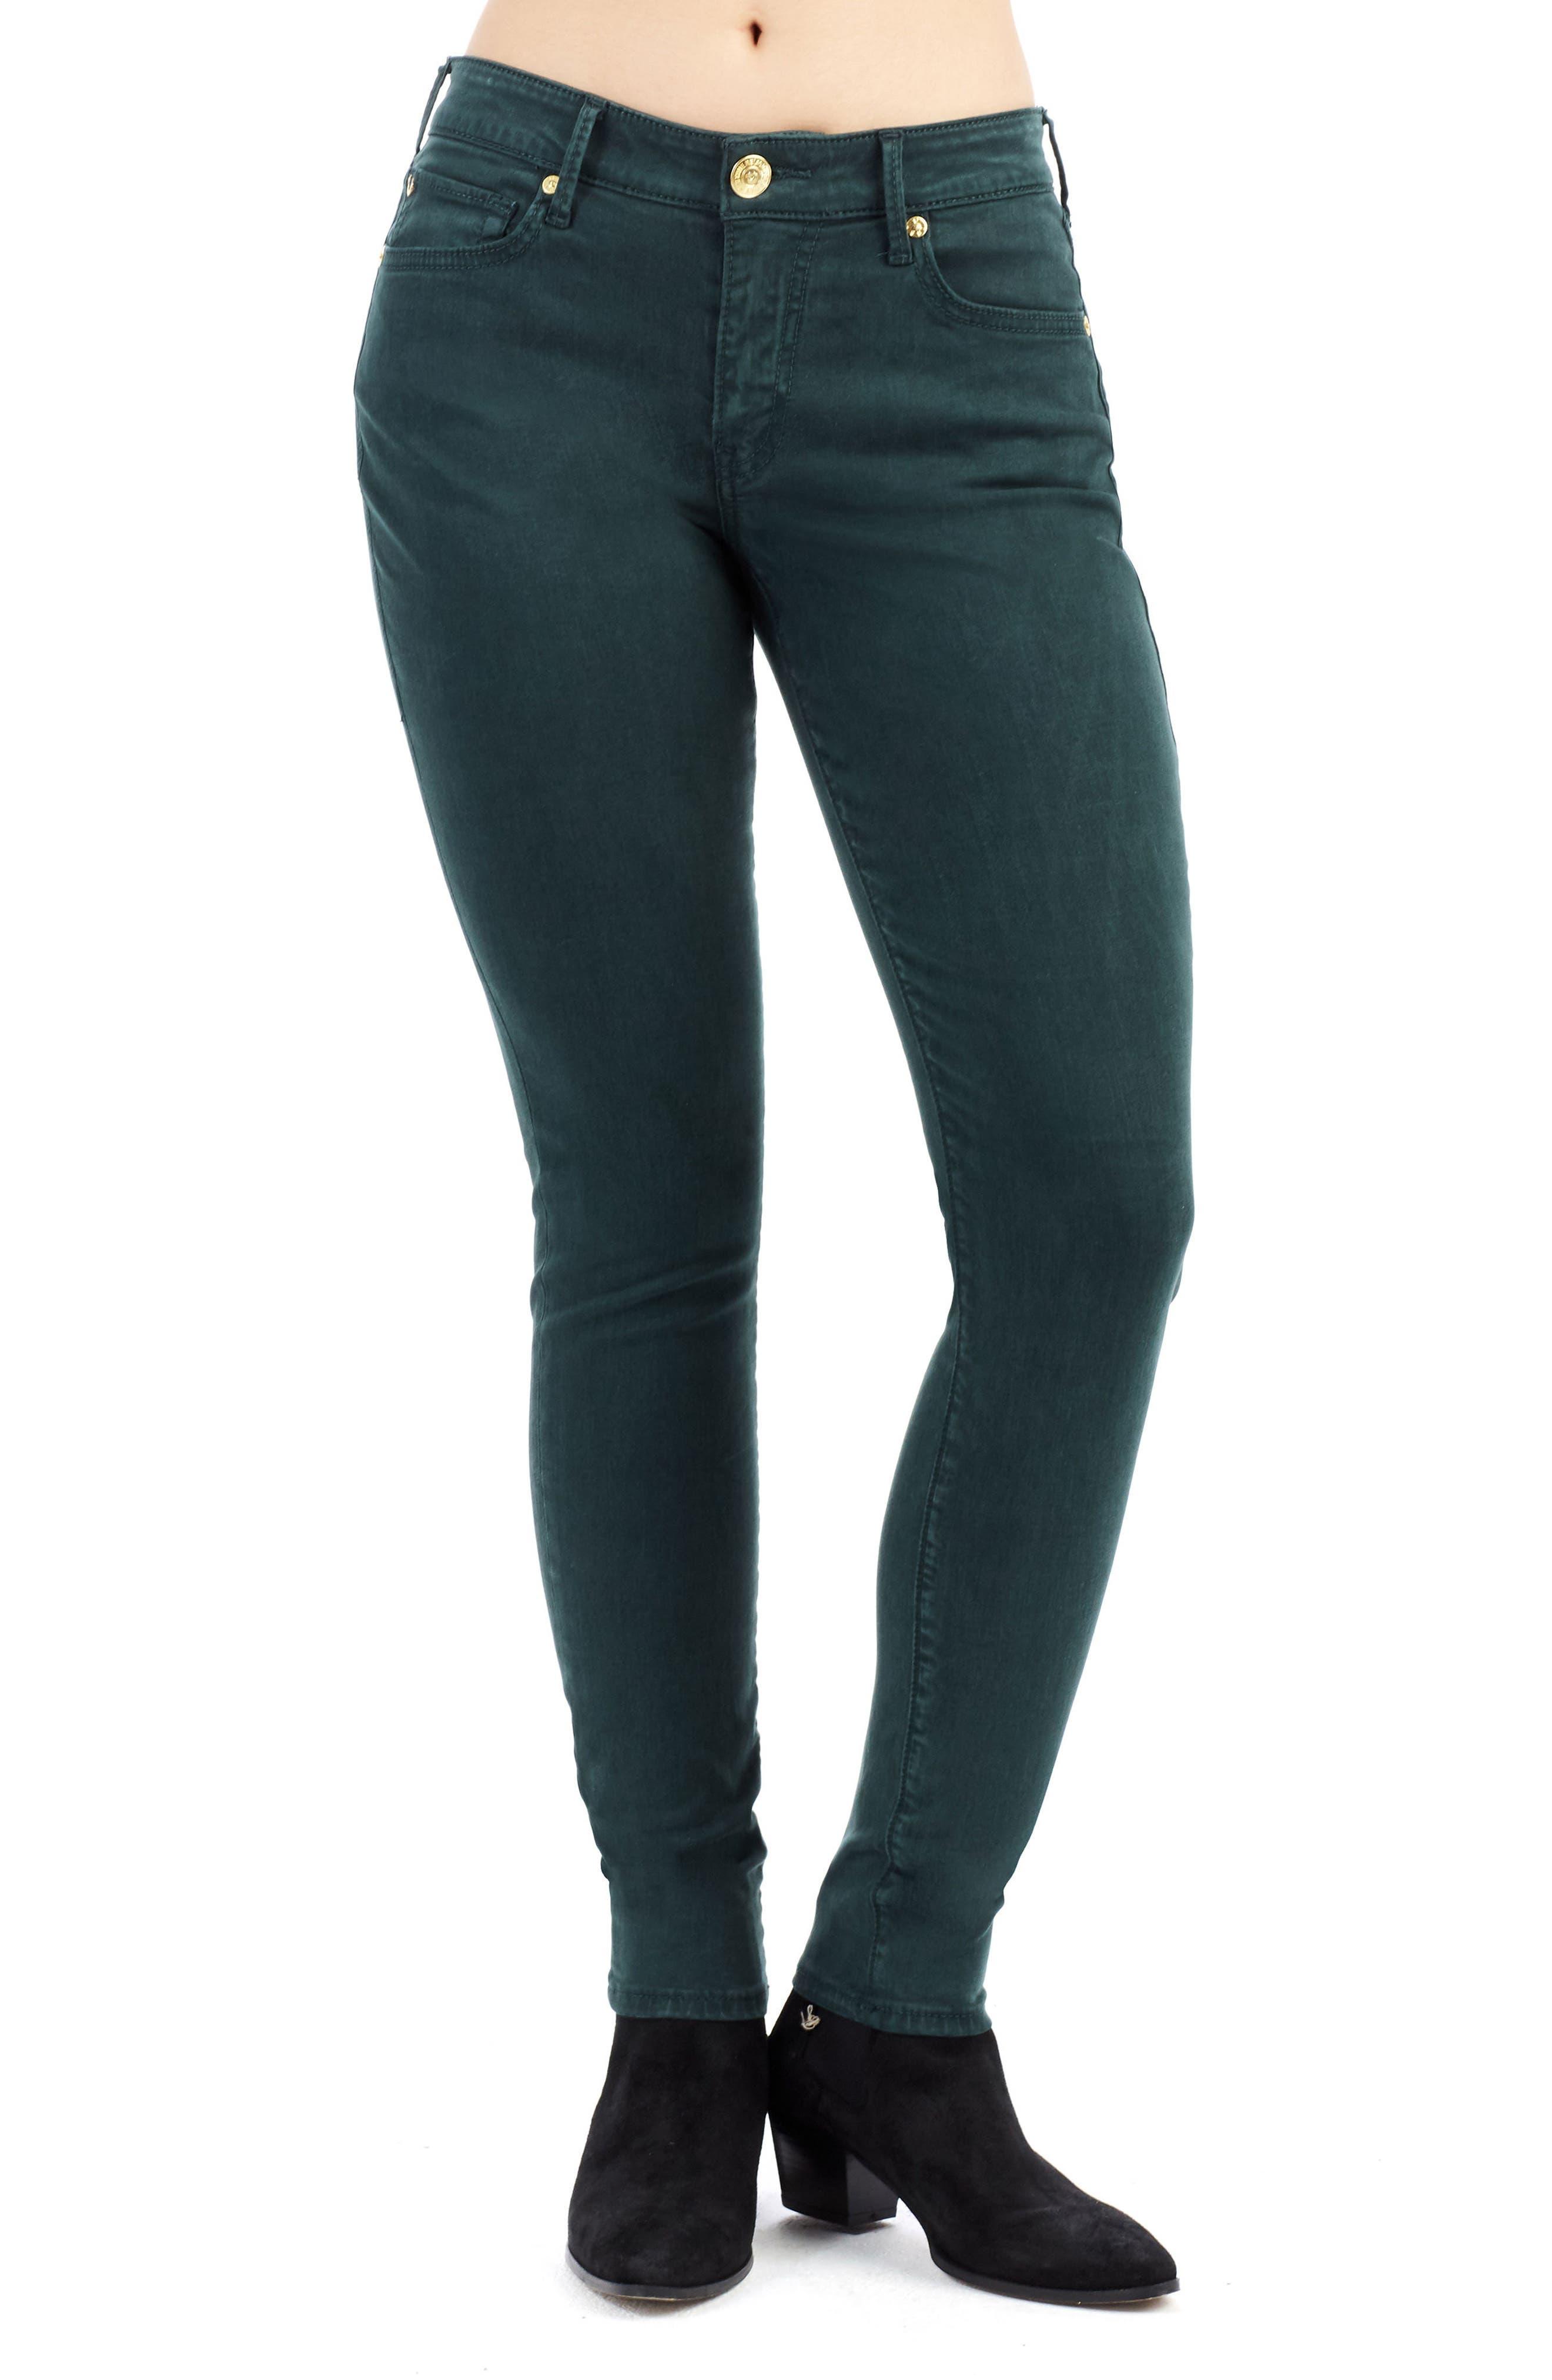 Jennie Curvy Skinny Jeans,                         Main,                         color, Hunter Green